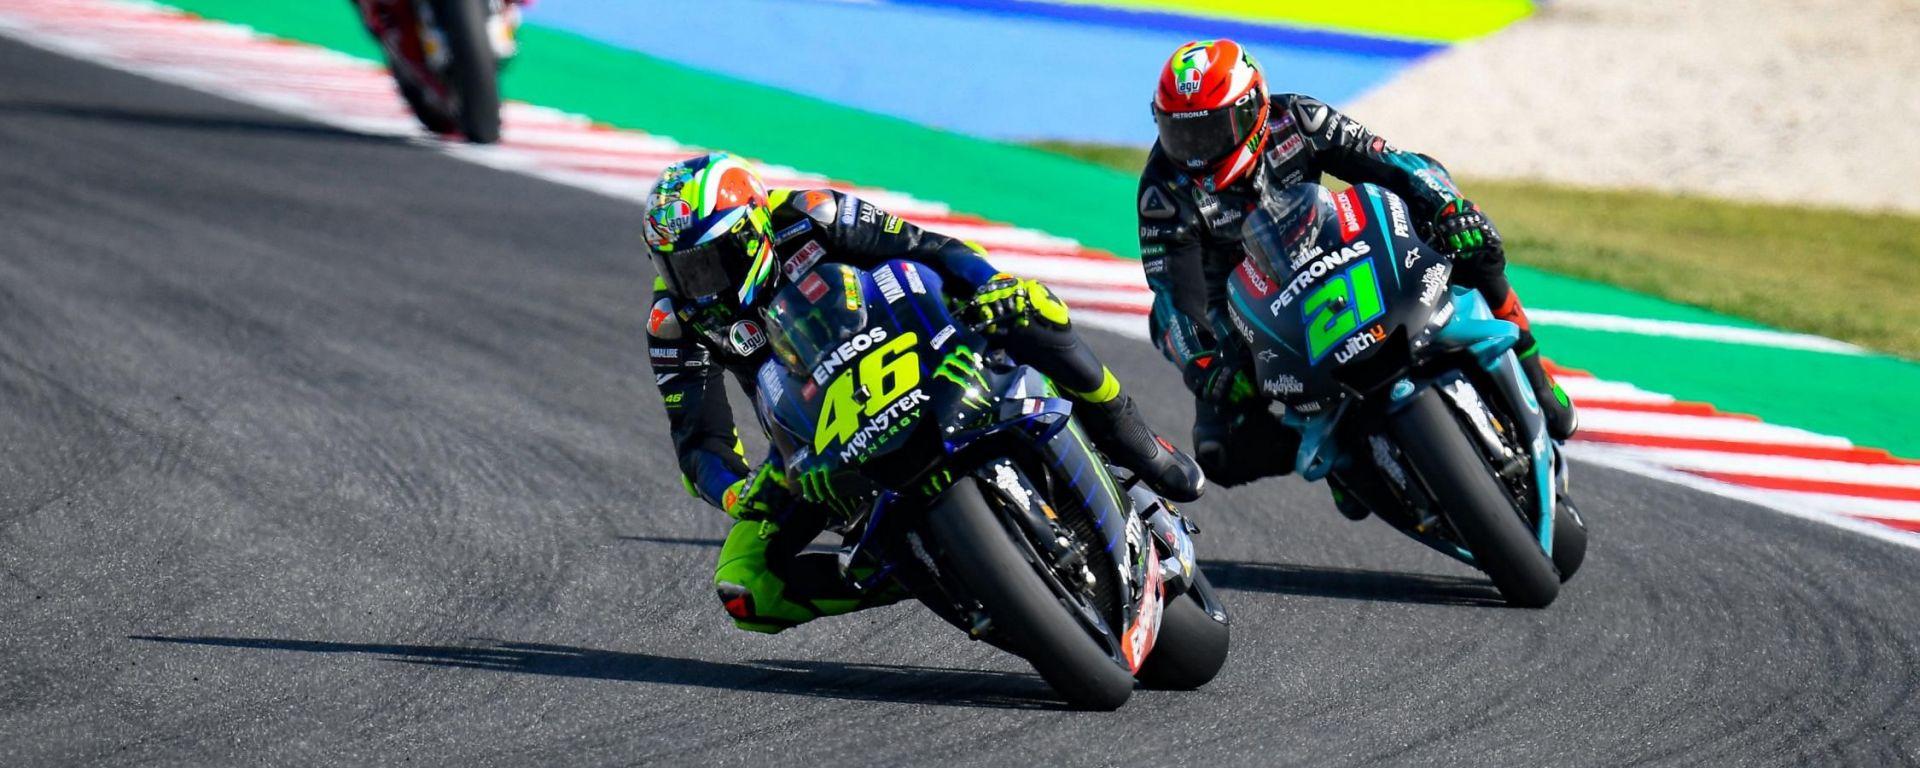 MotoGP 2020, Valentino Rossi e Franco Morbidelli (Yamaha)